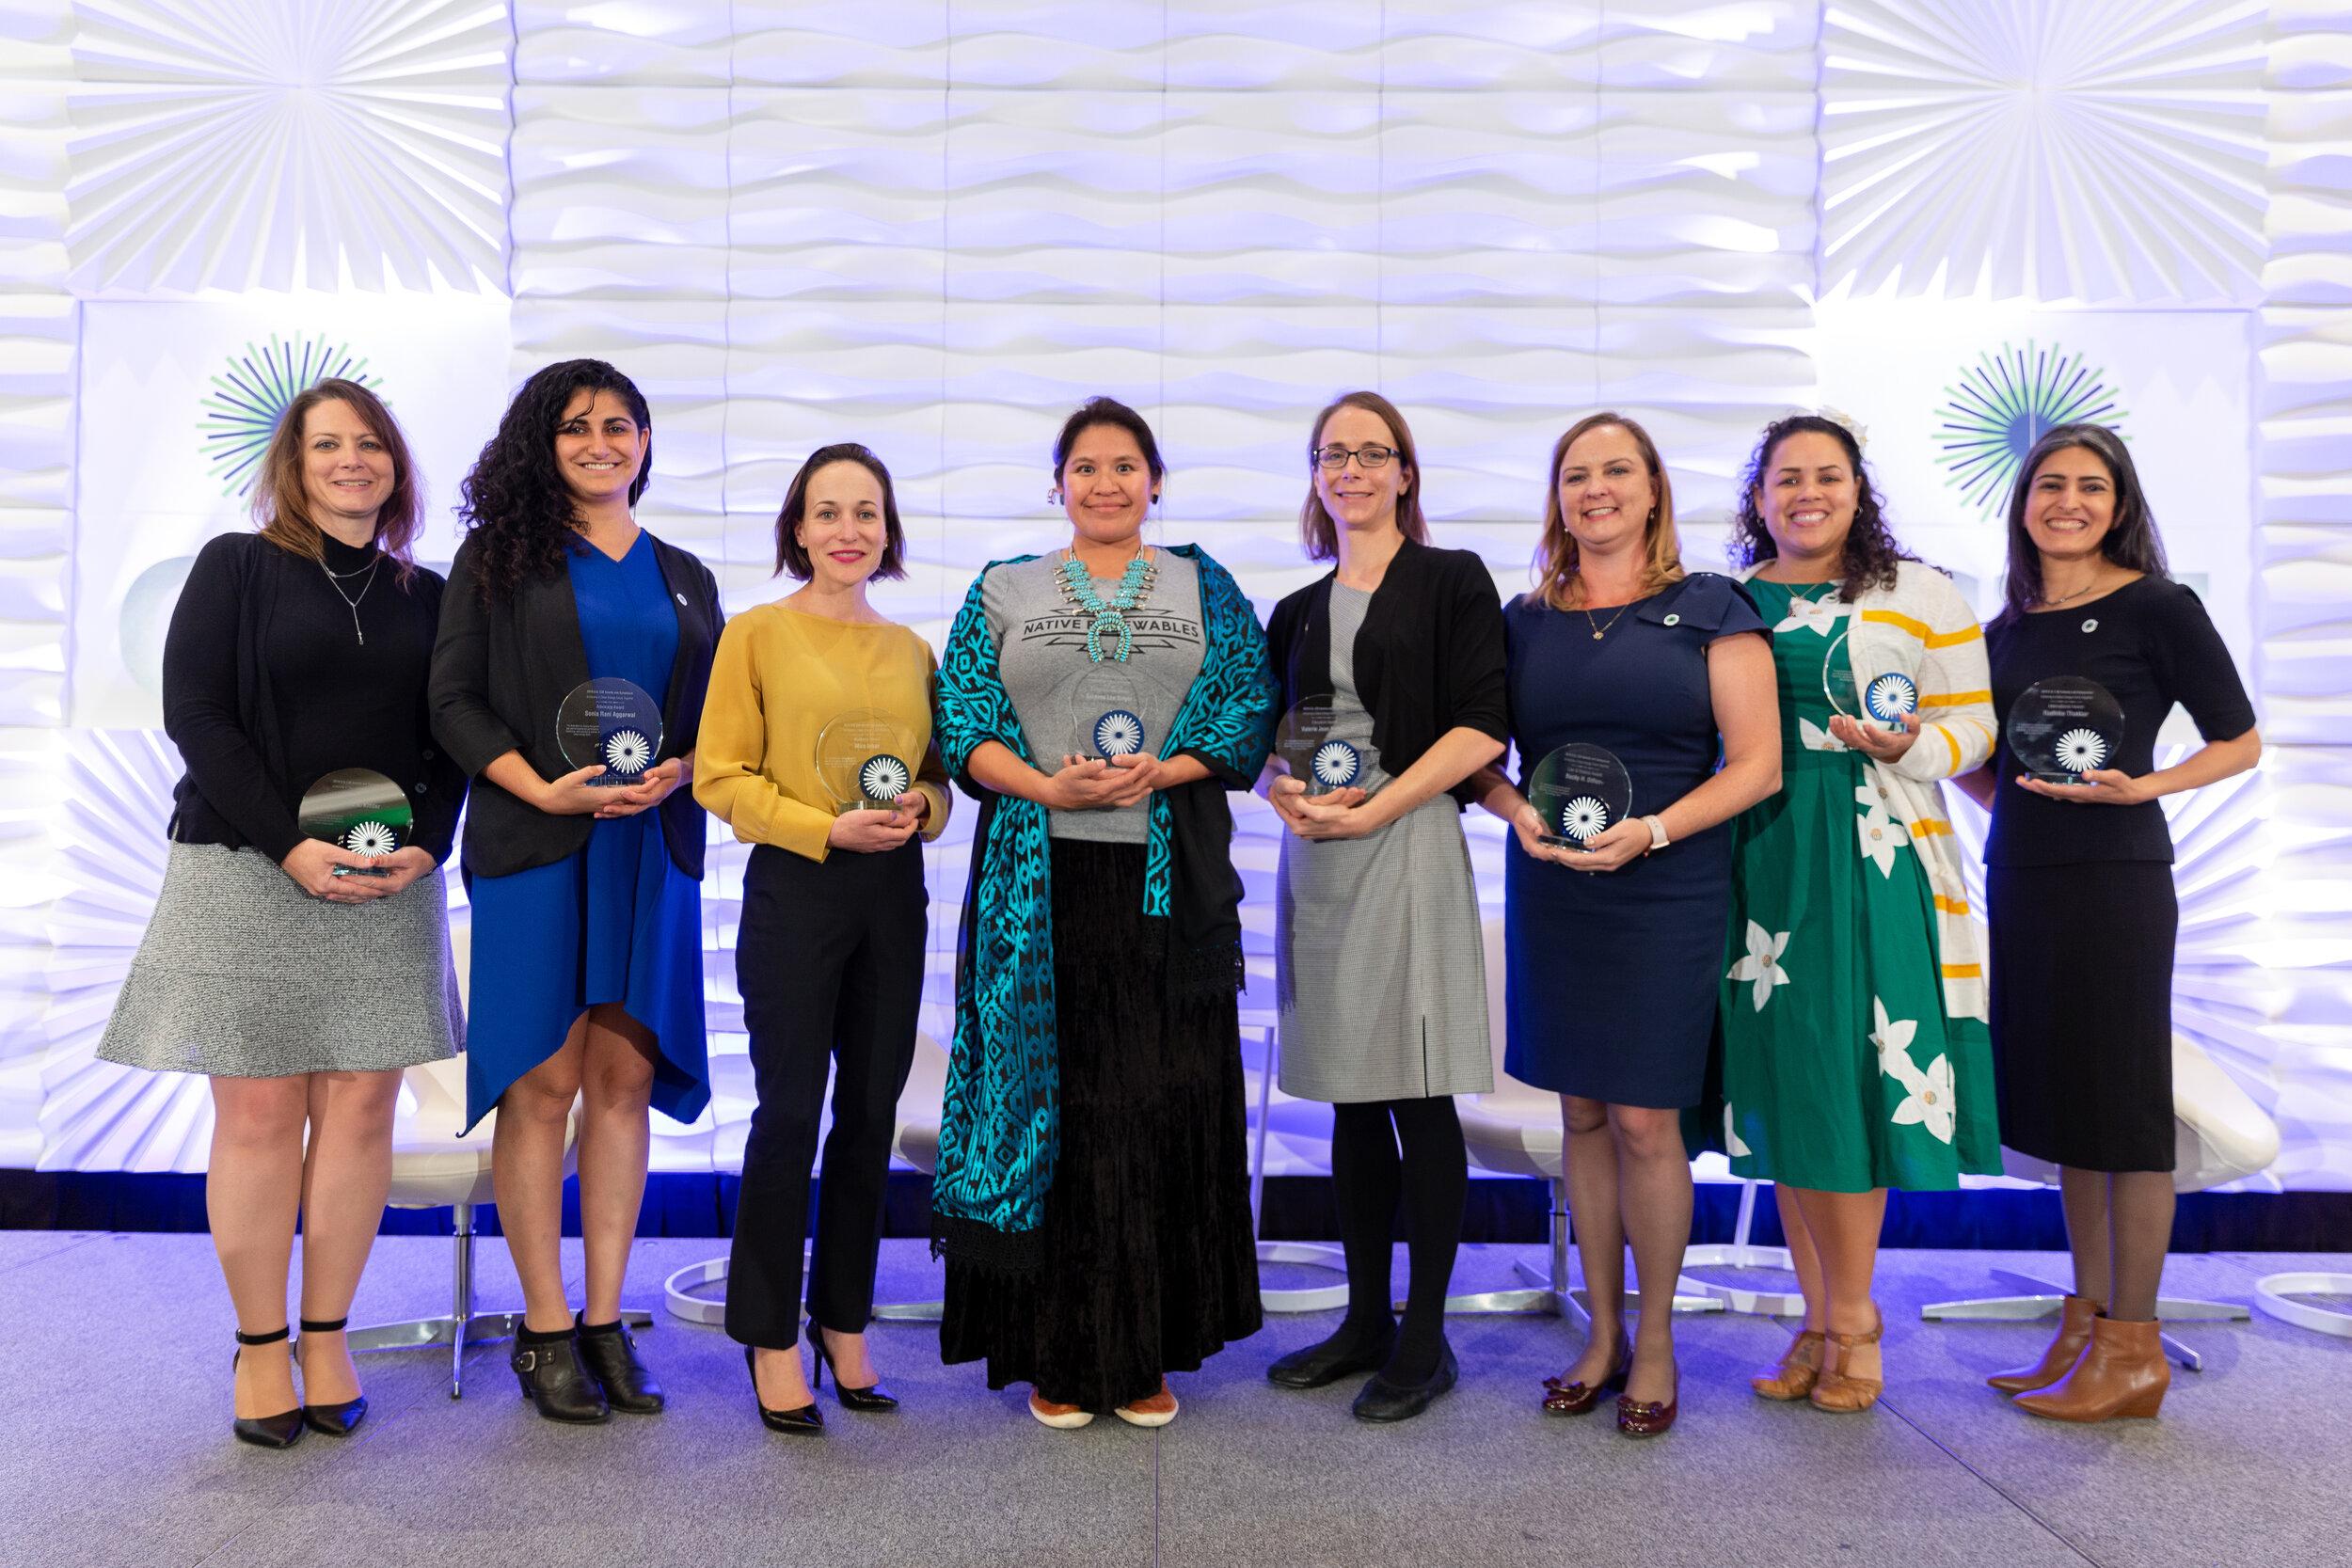 2019 Texas A&M C3E Award Winners